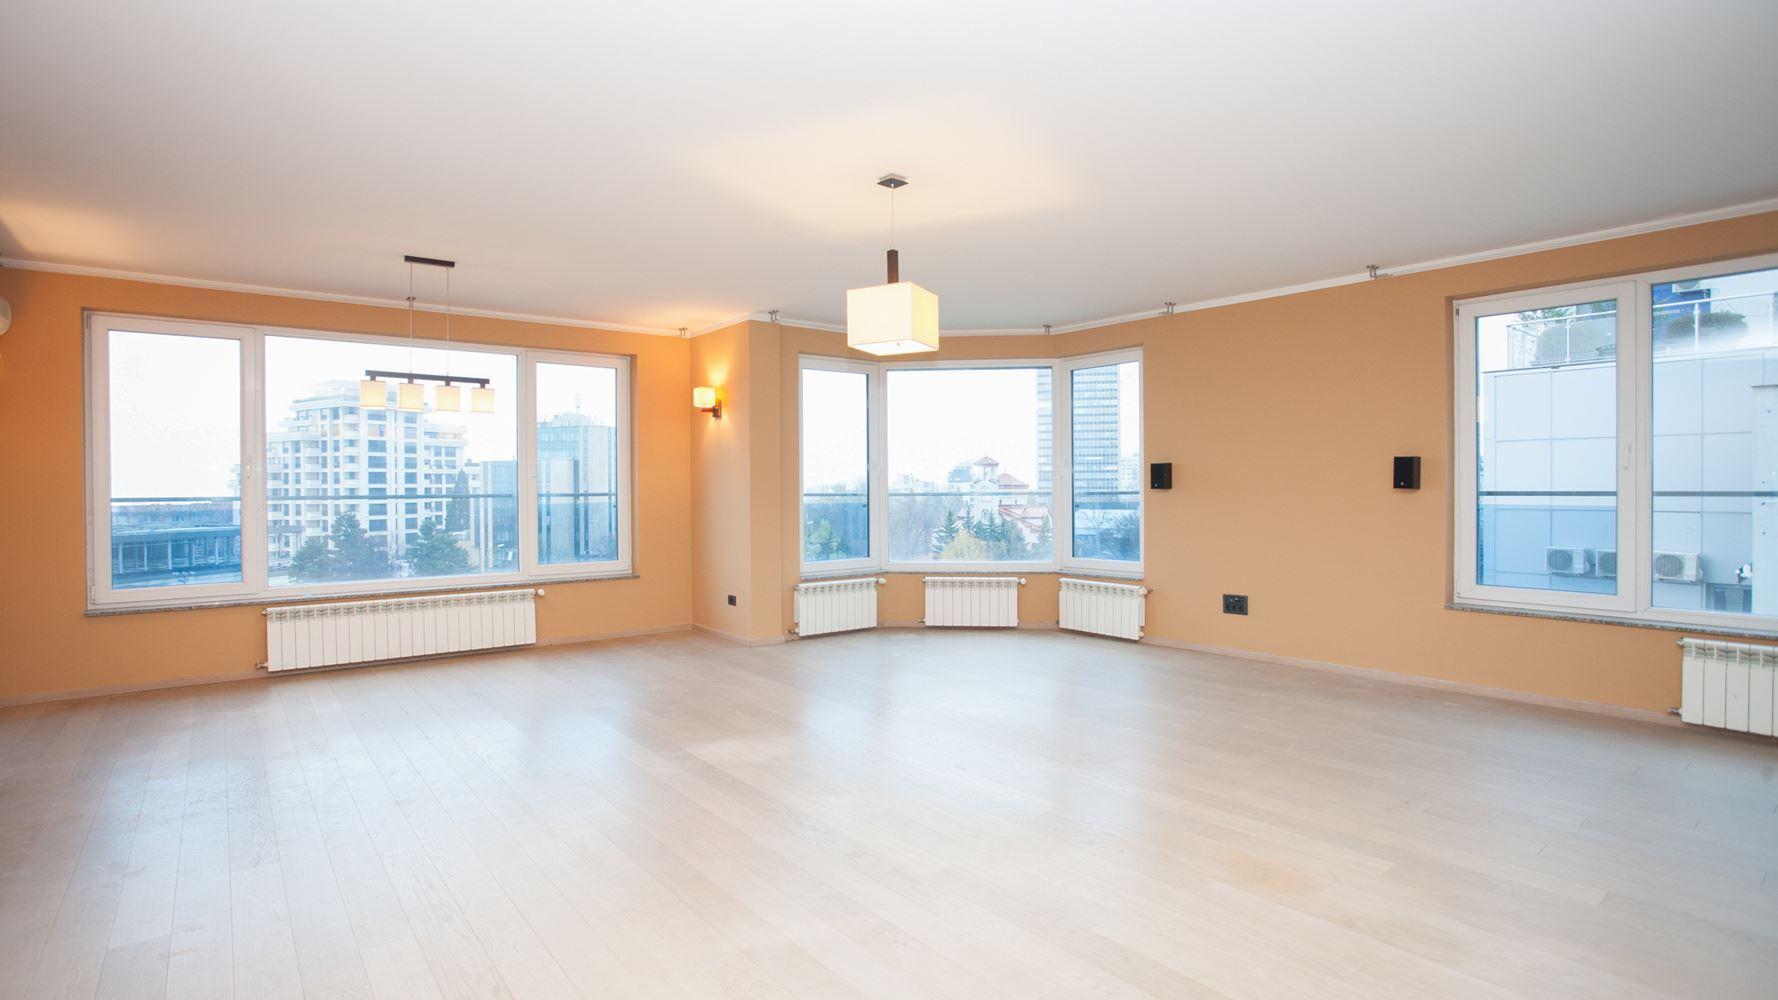 3-bedroom Apartment for Rent, Lozenets